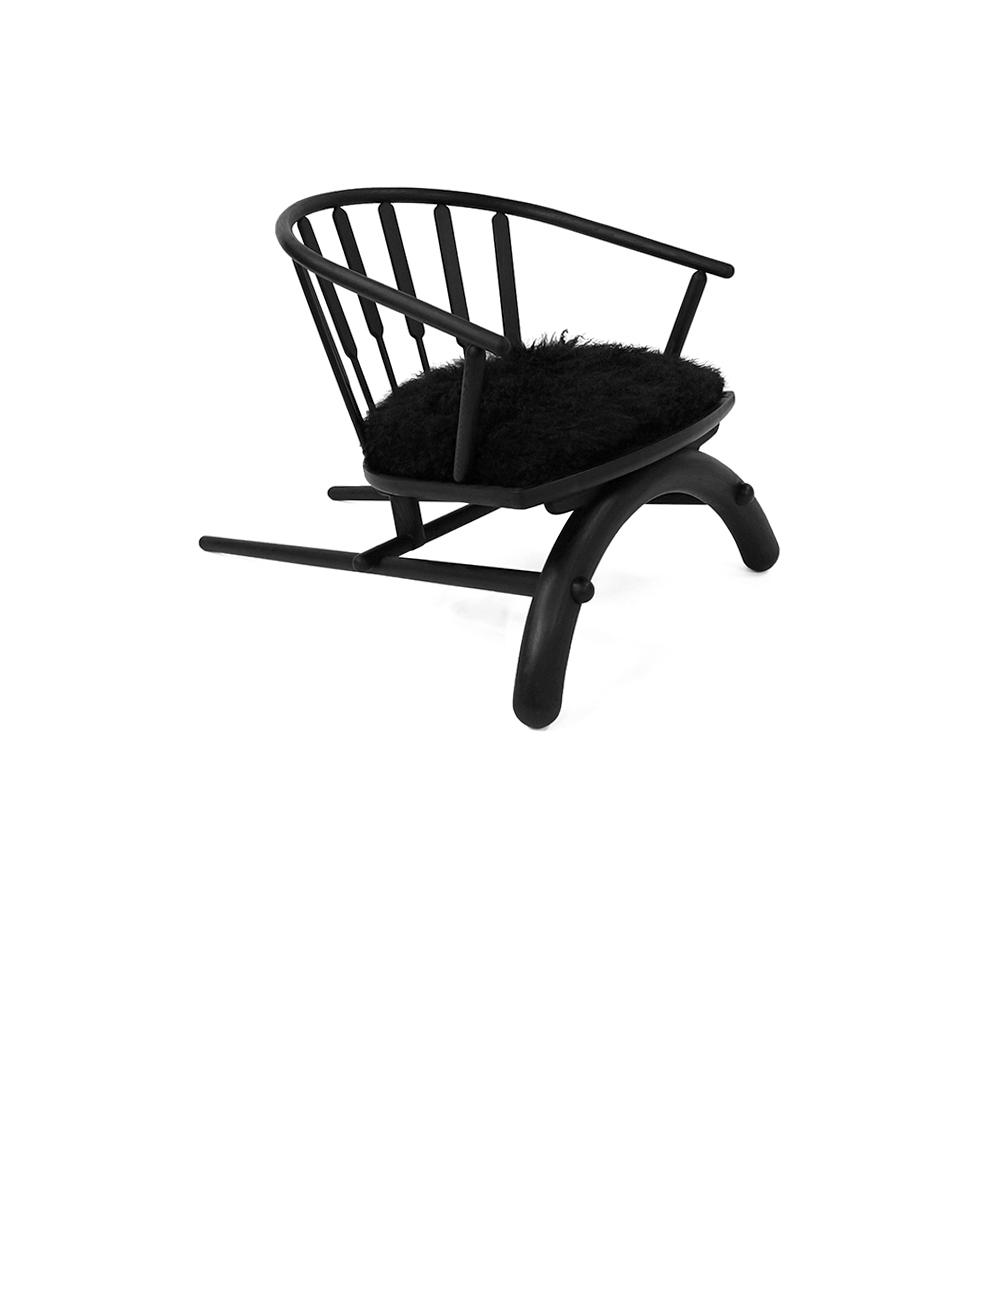 Rainbow Chair - Ash Wood Frame Chair with Mongolian Sheep Wool Seat